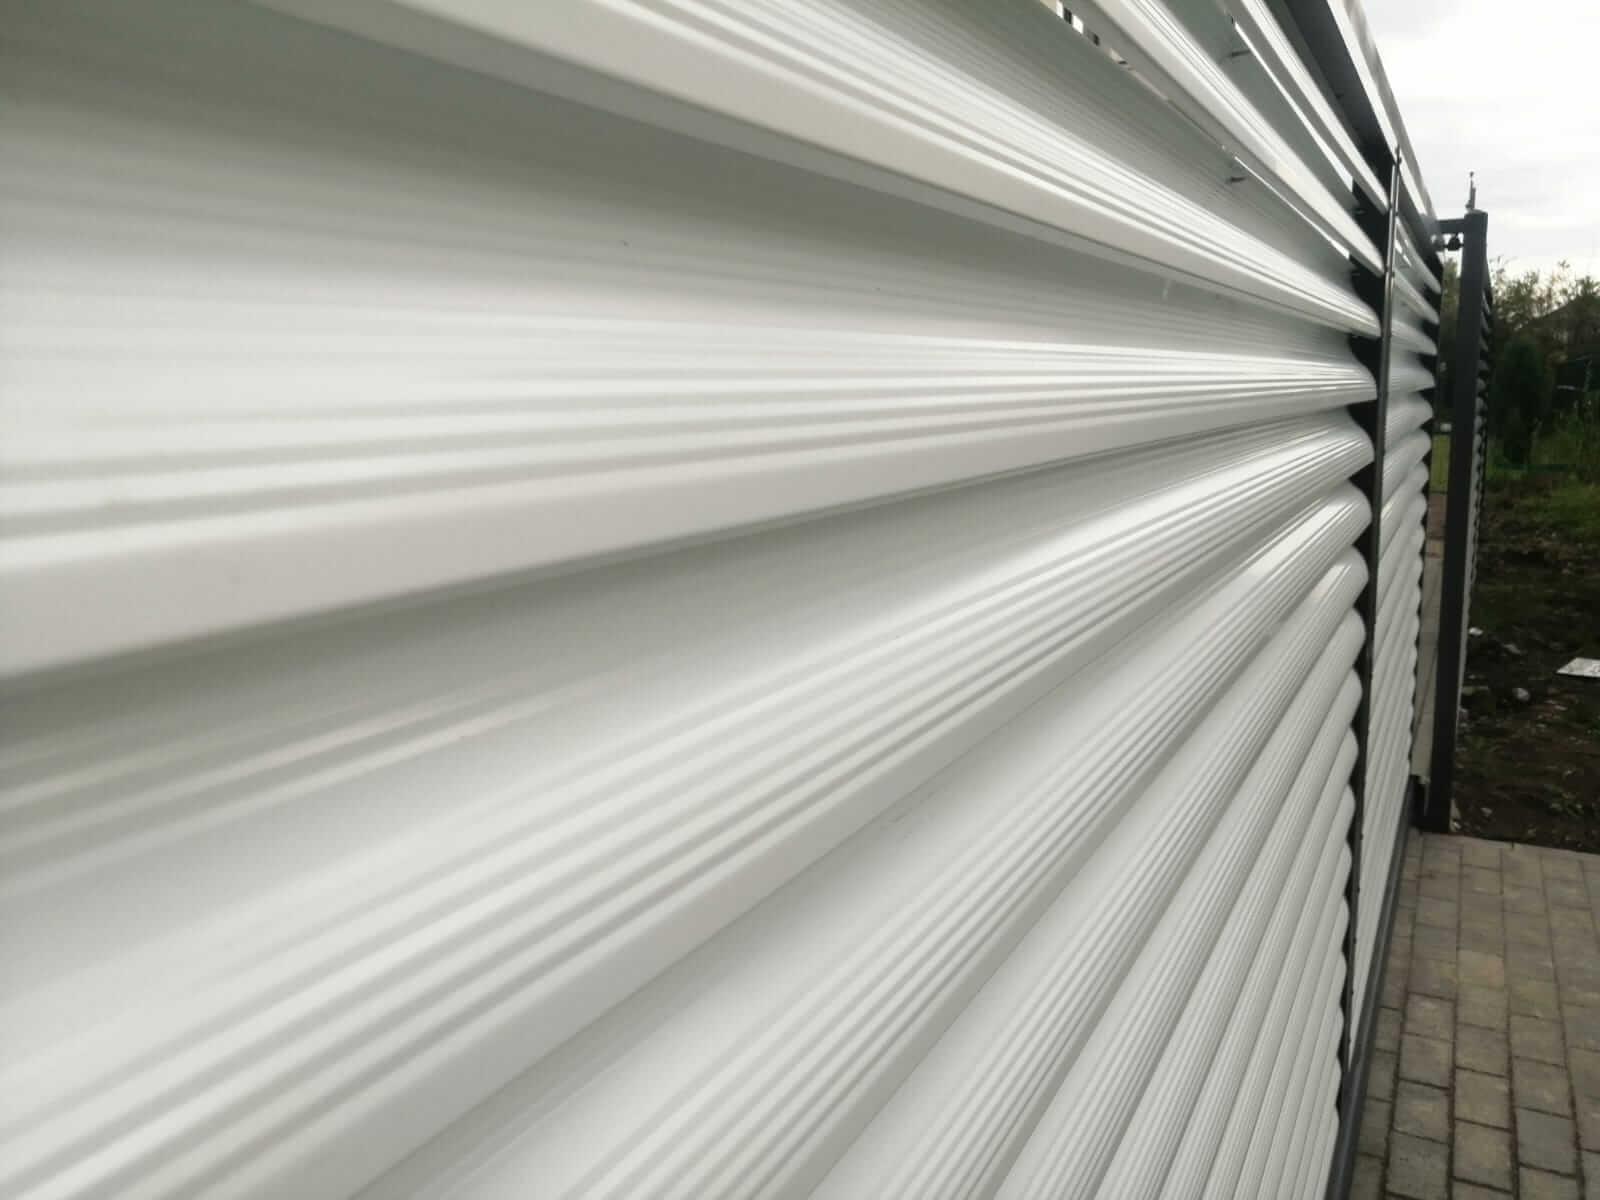 забор-жалюзи белый двухсторонний фото3